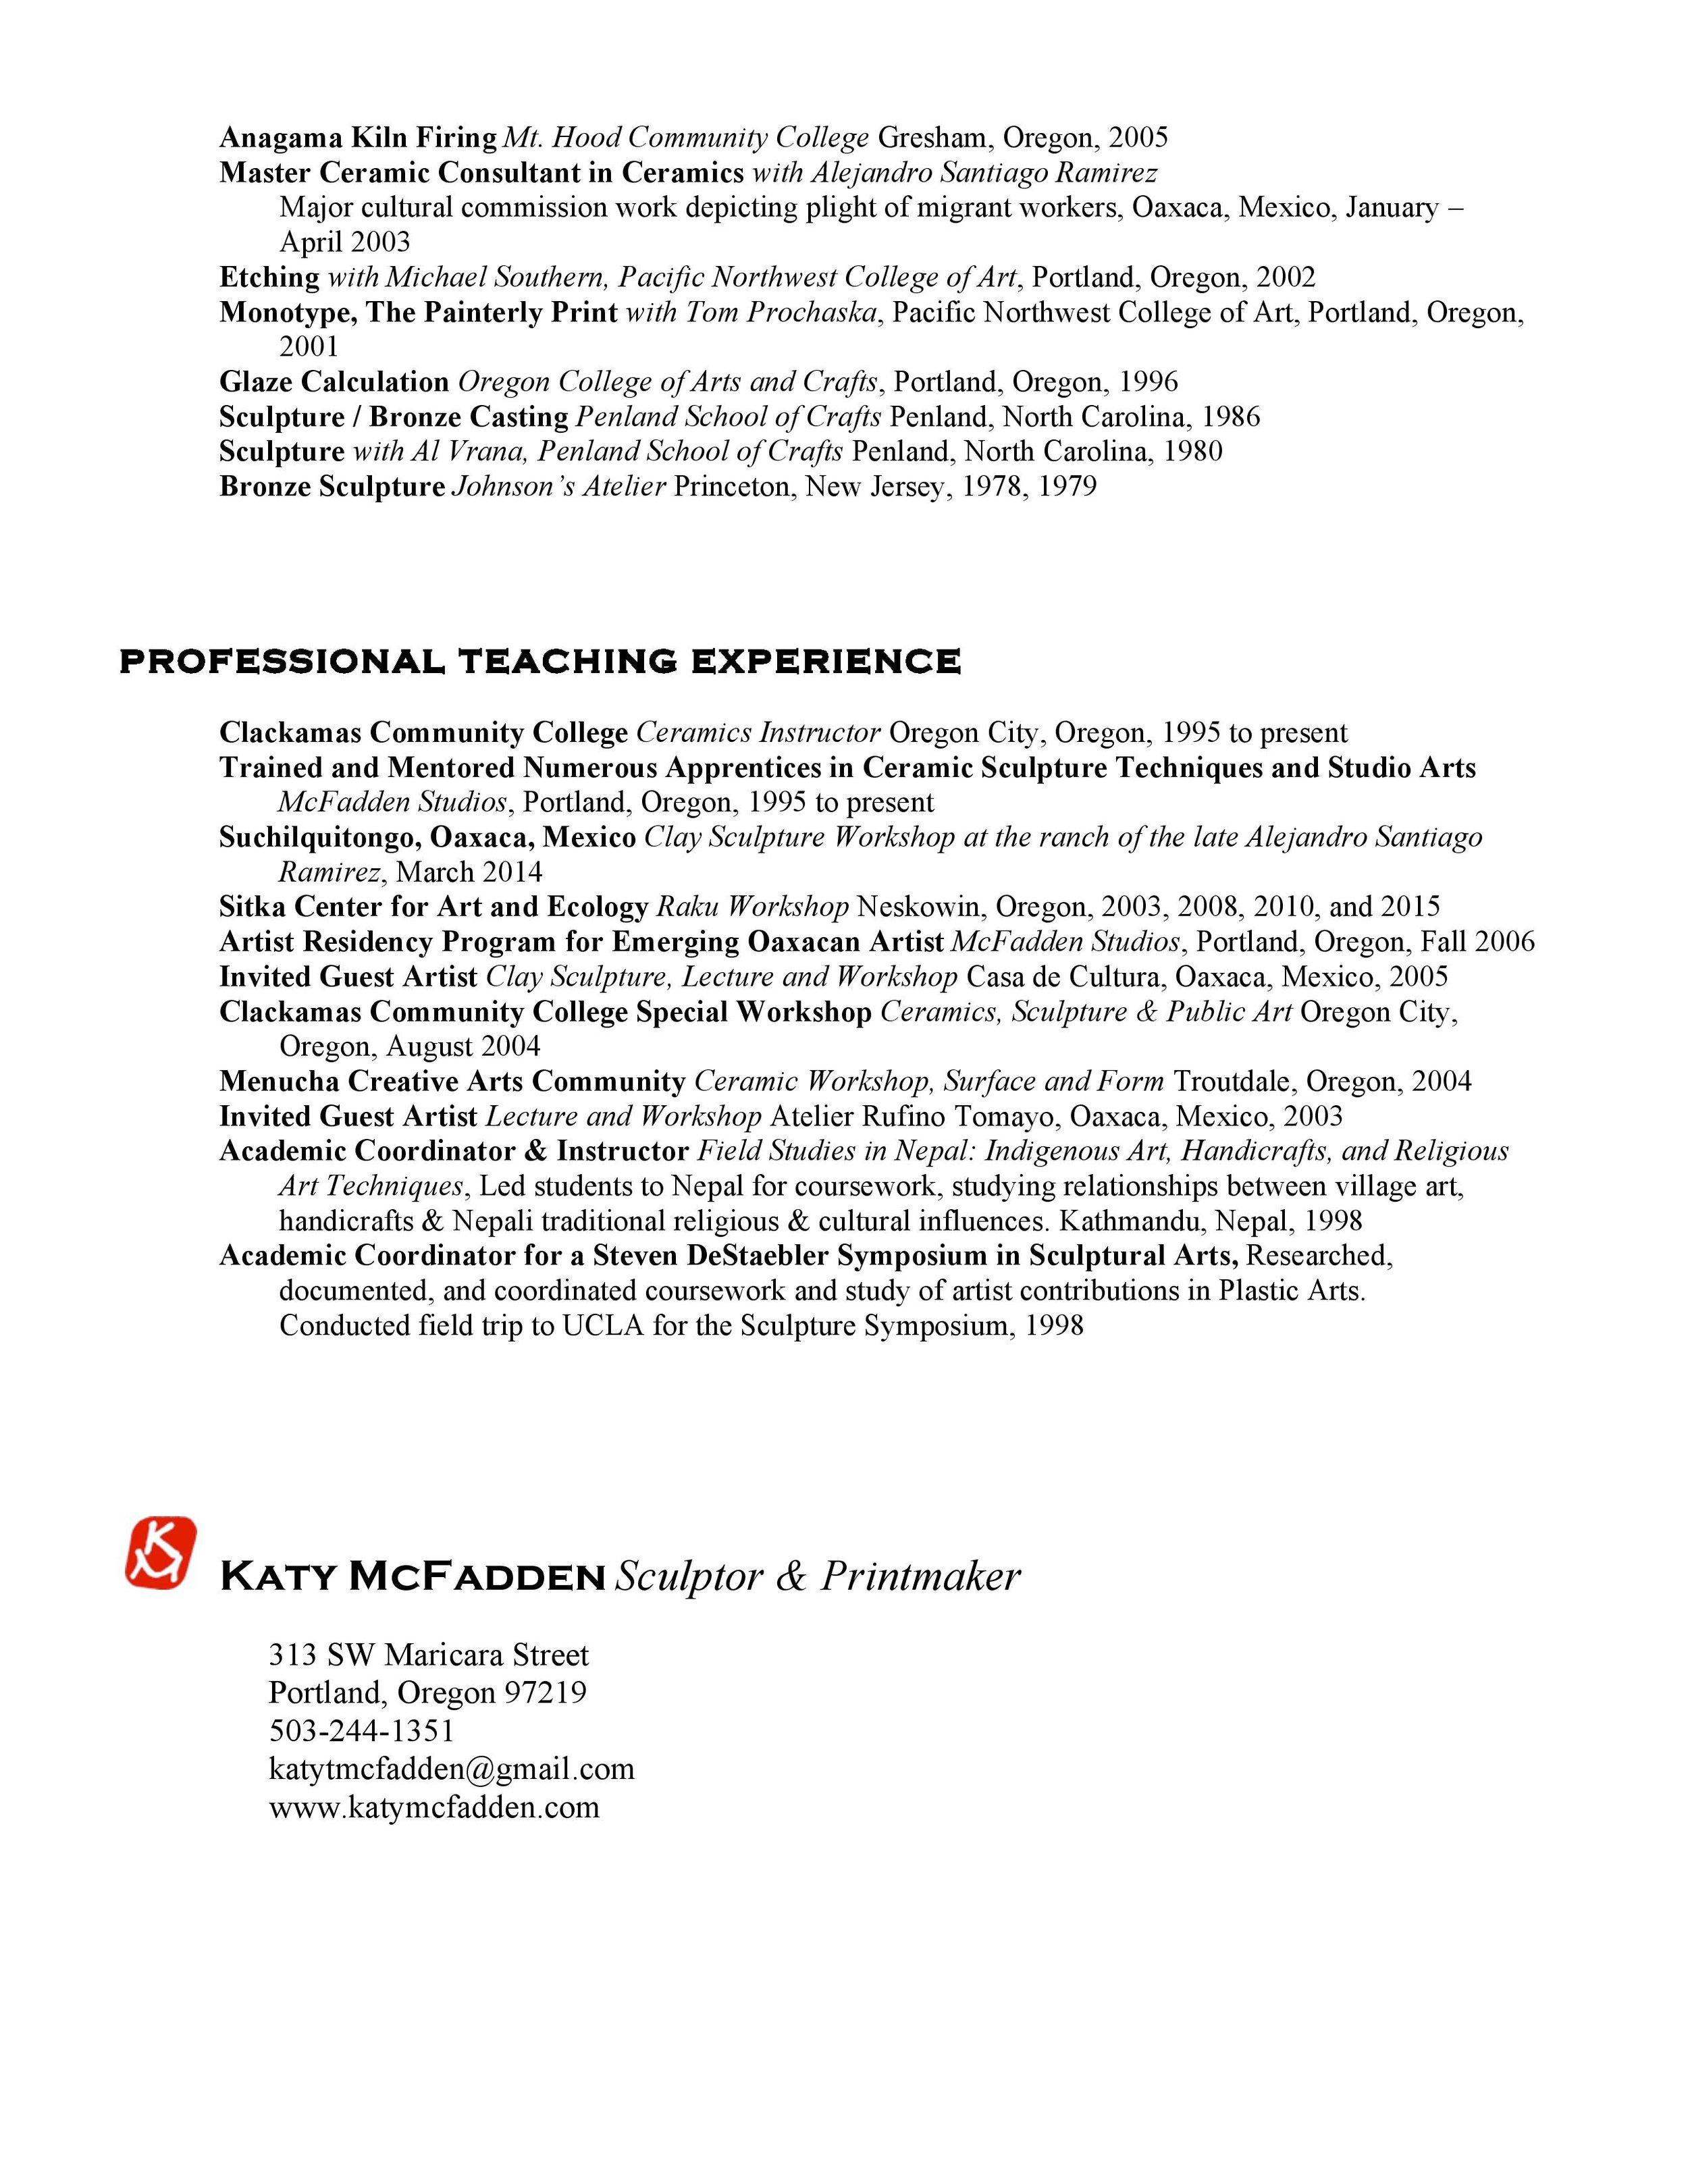 Resume_4-18-page-003(1).jpg